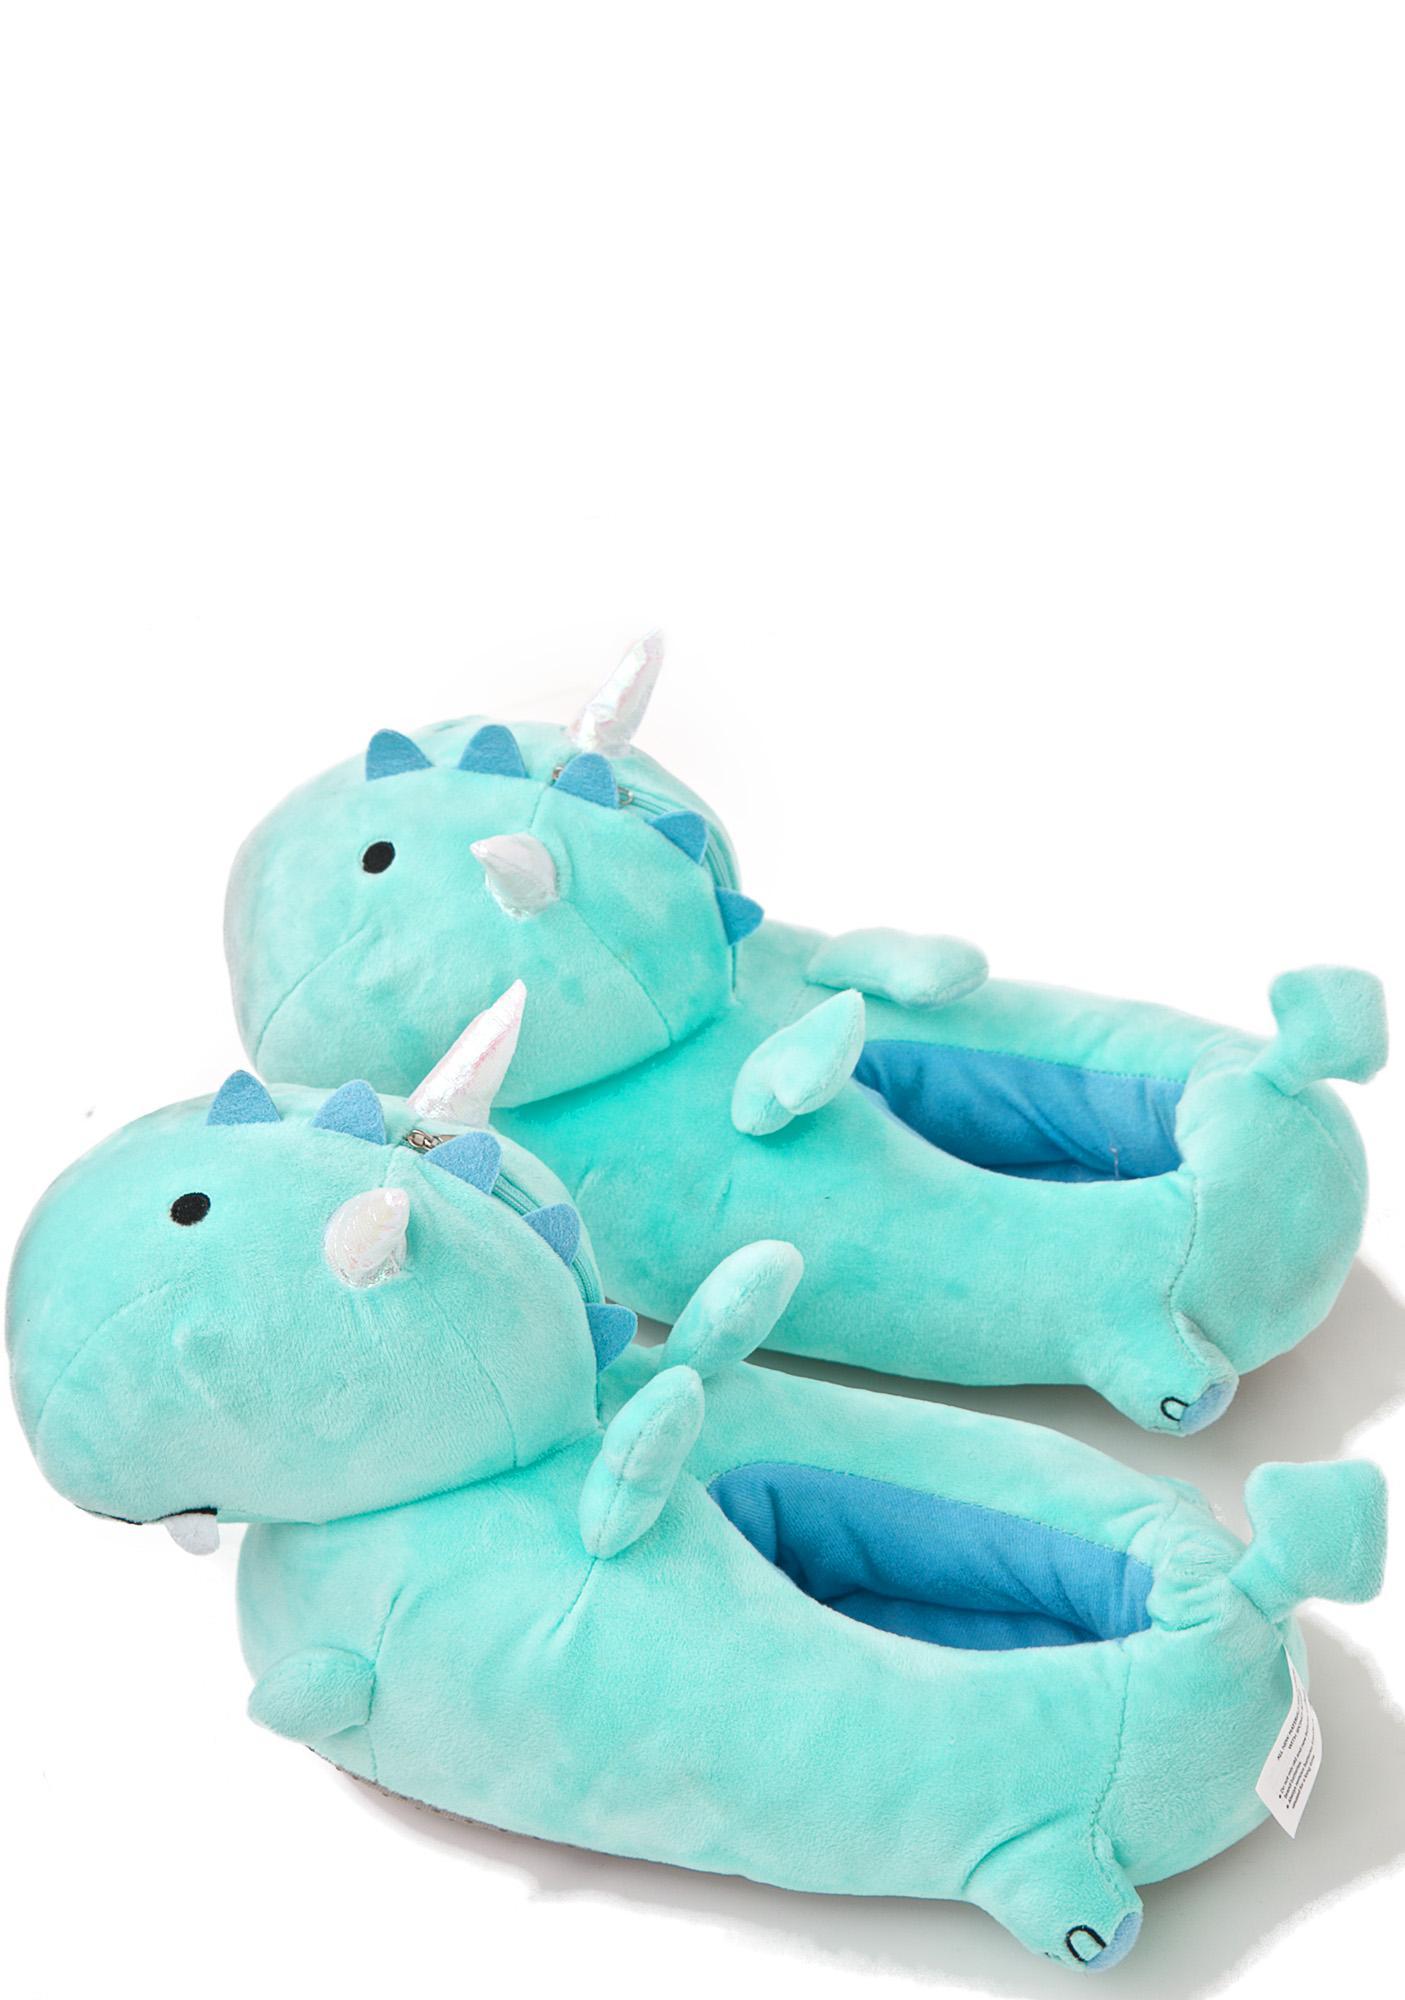 Smoko Dragon BB Light-Up Slippers